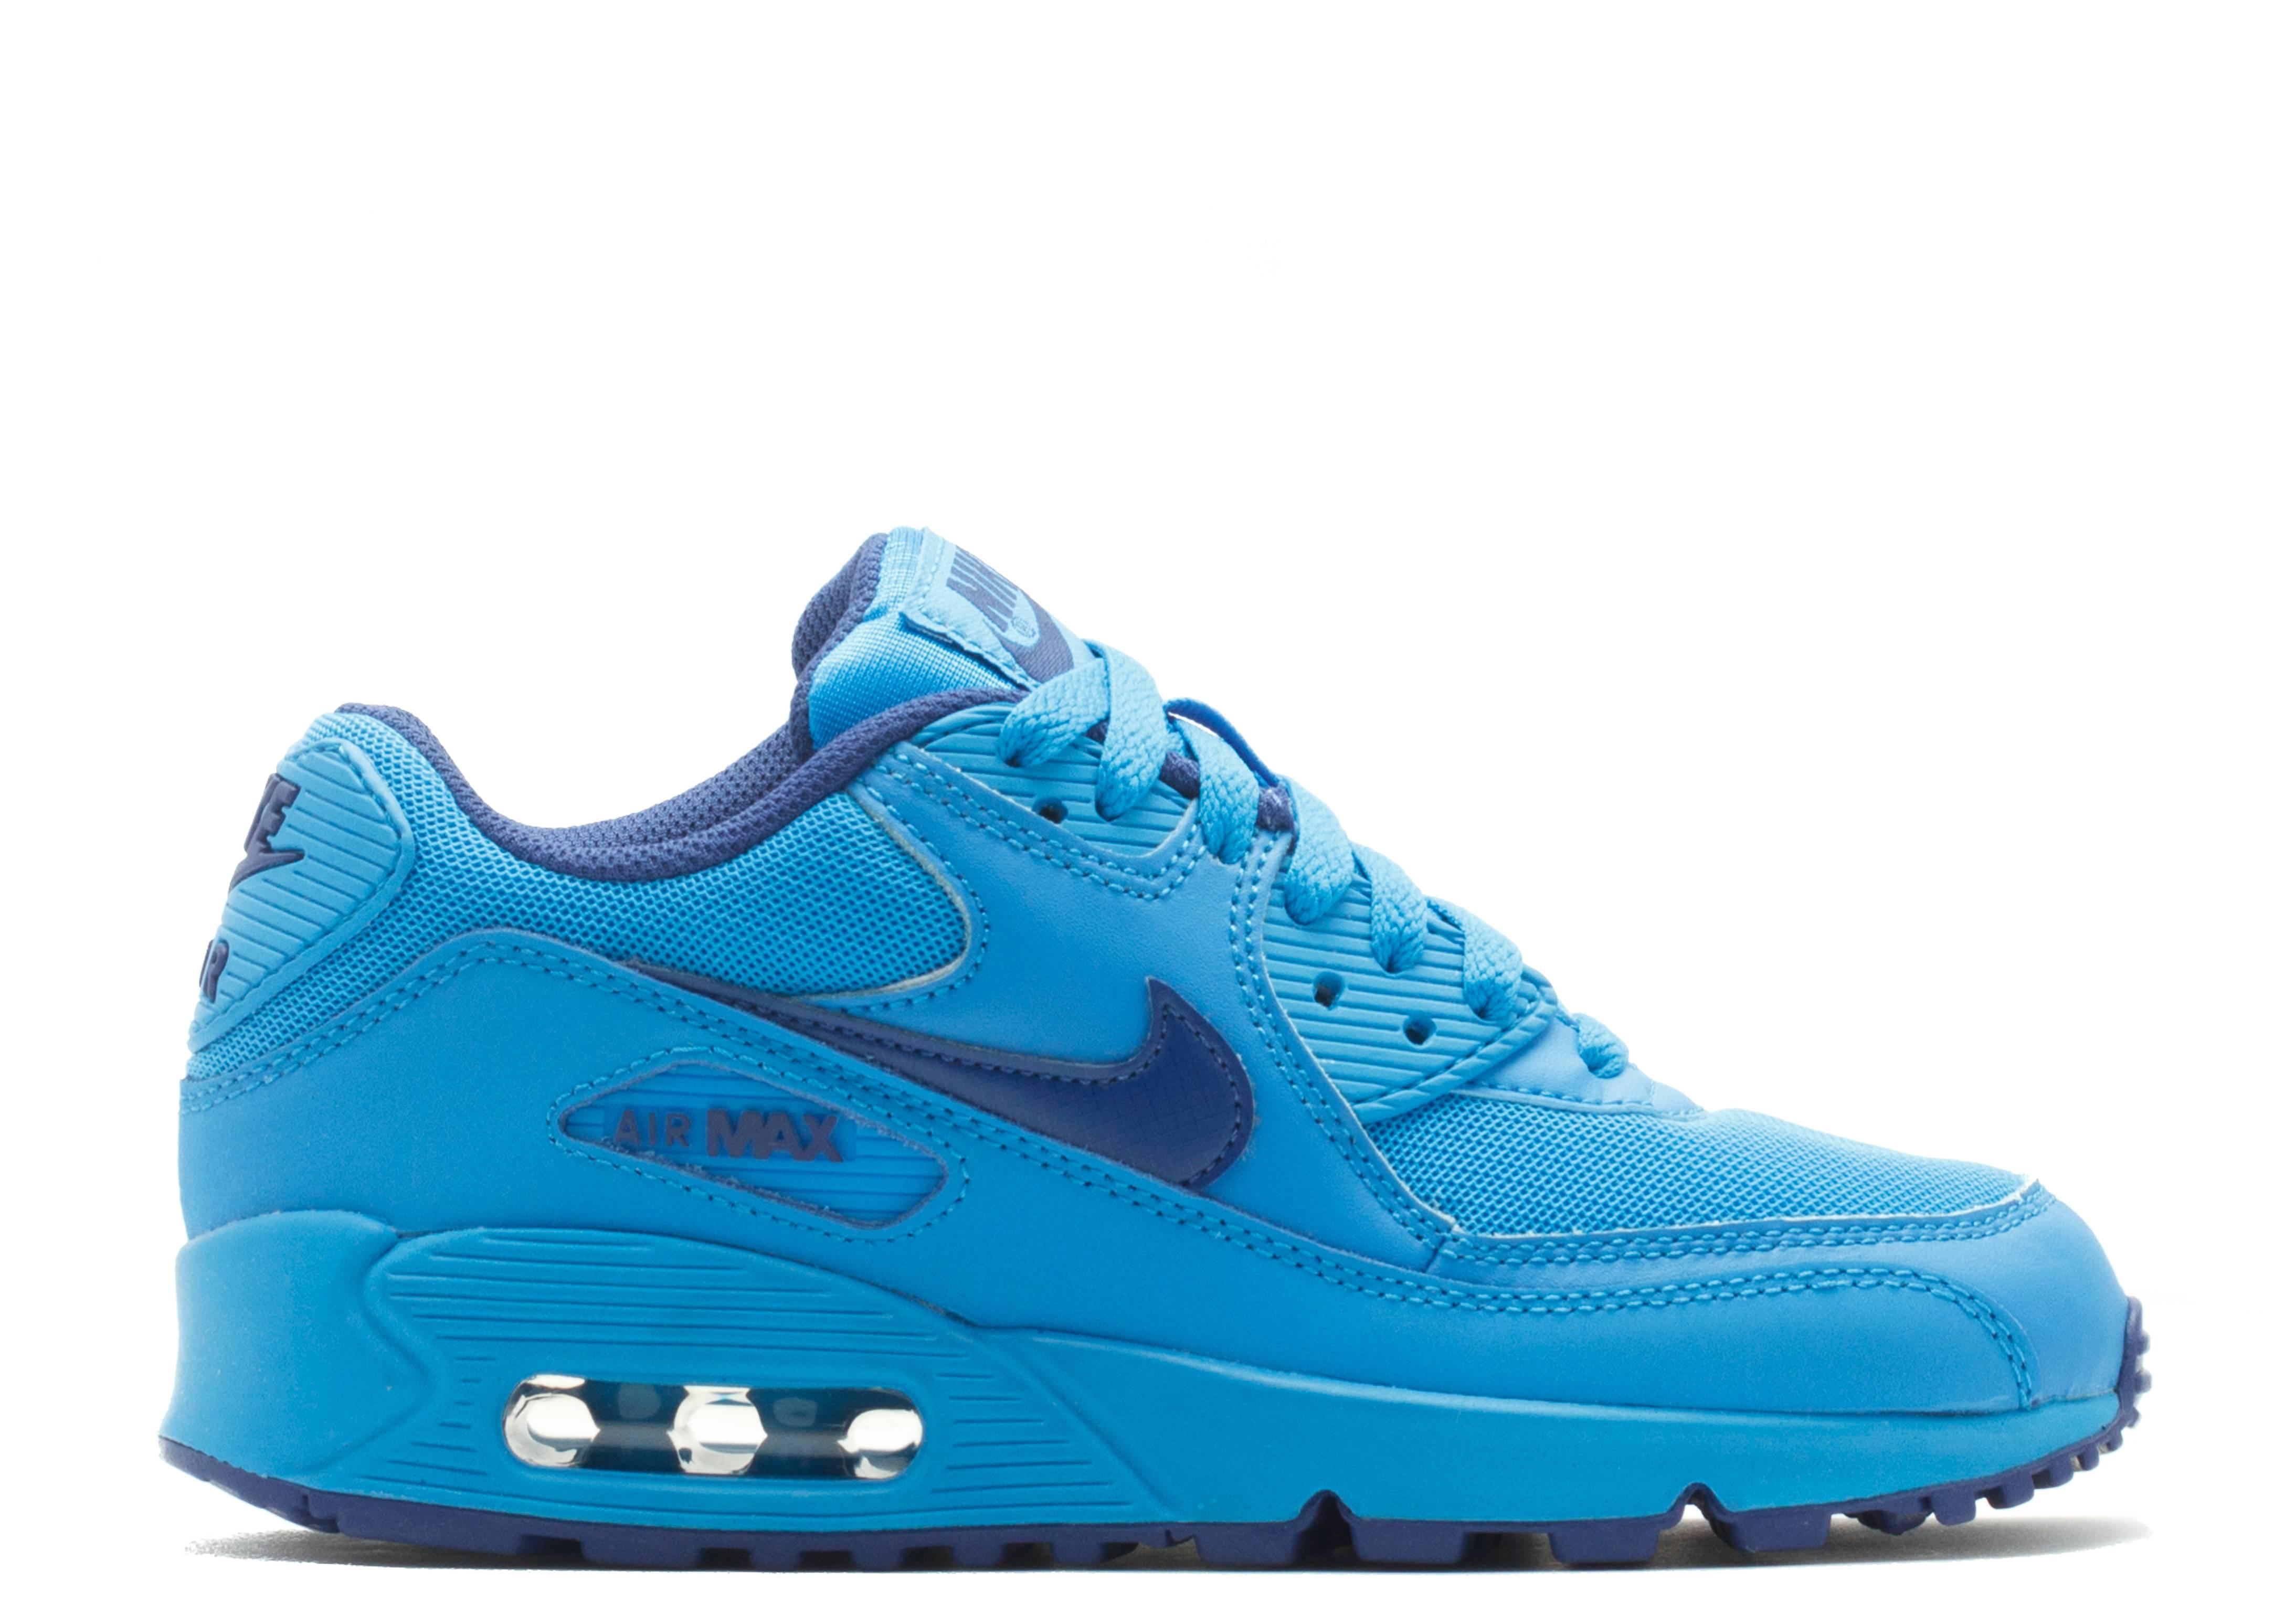 separation shoes 4b371 85695 Air Max 90 (gs) - Nike - 307793 408 - photo blue deep royal blue   Flight  Club